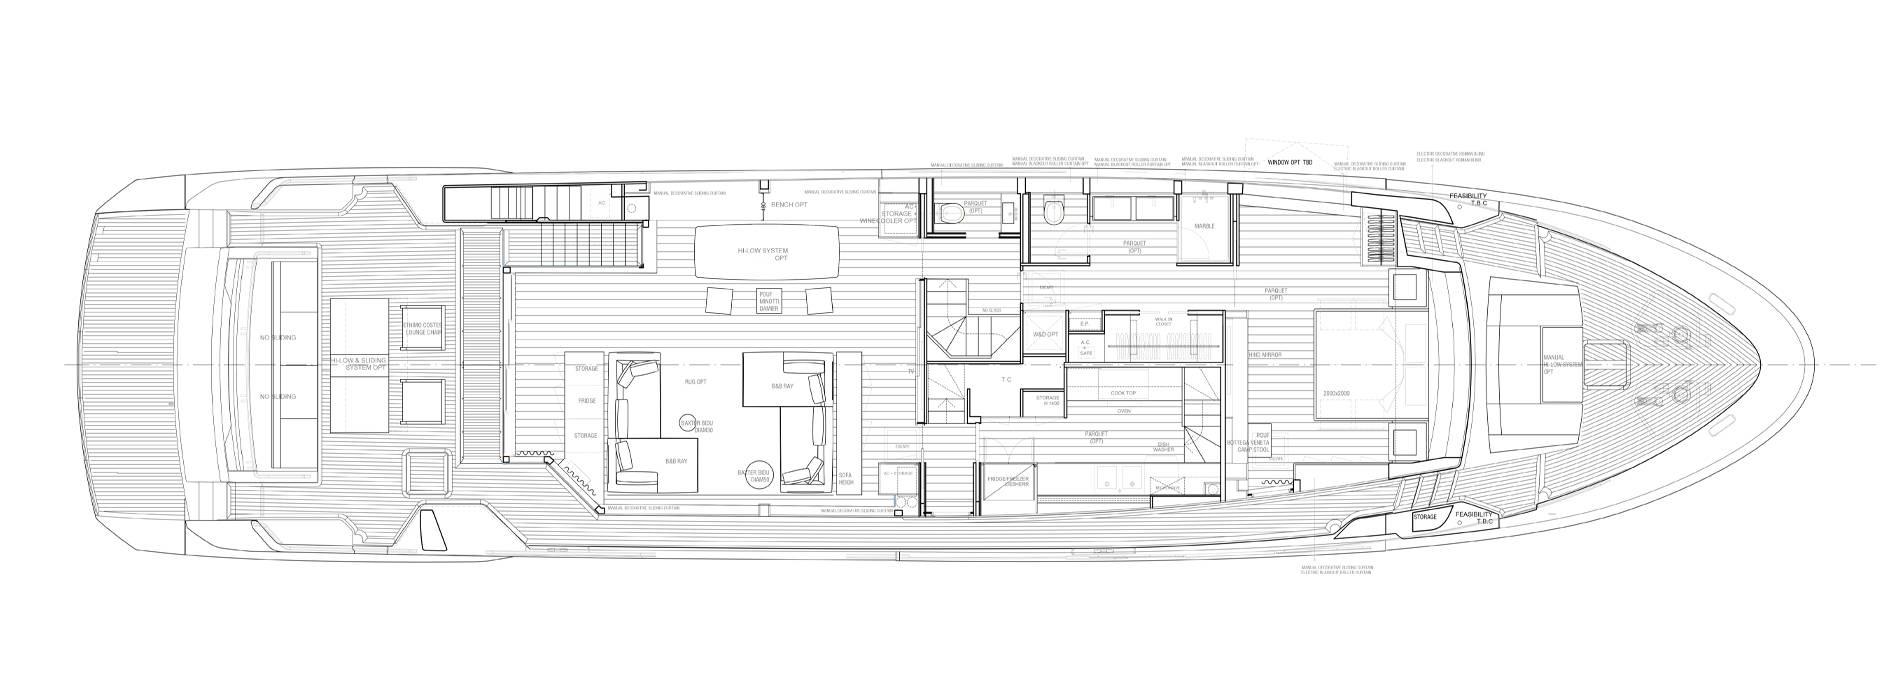 Sanlorenzo Yachts SL102A-746  Hauptdeck